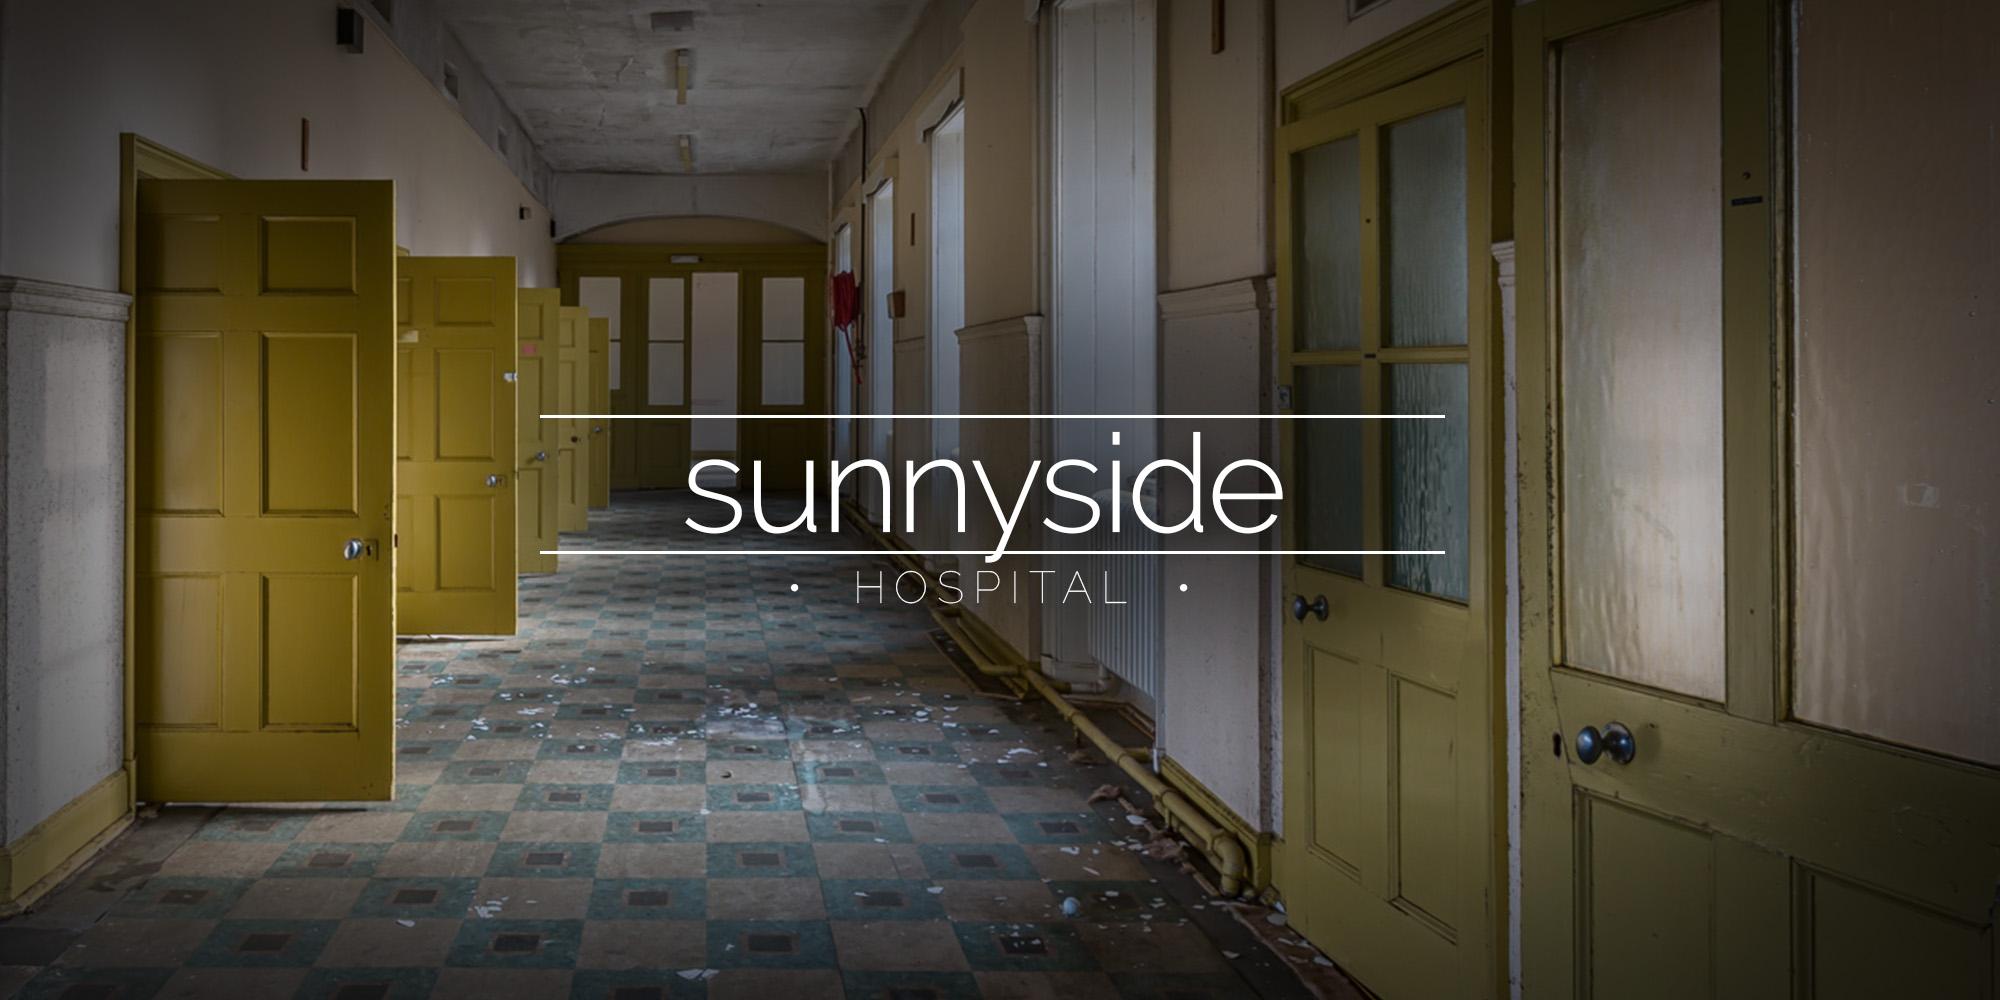 Sunnyside Hospital / Montrose Asylum, Hillside, Scotland